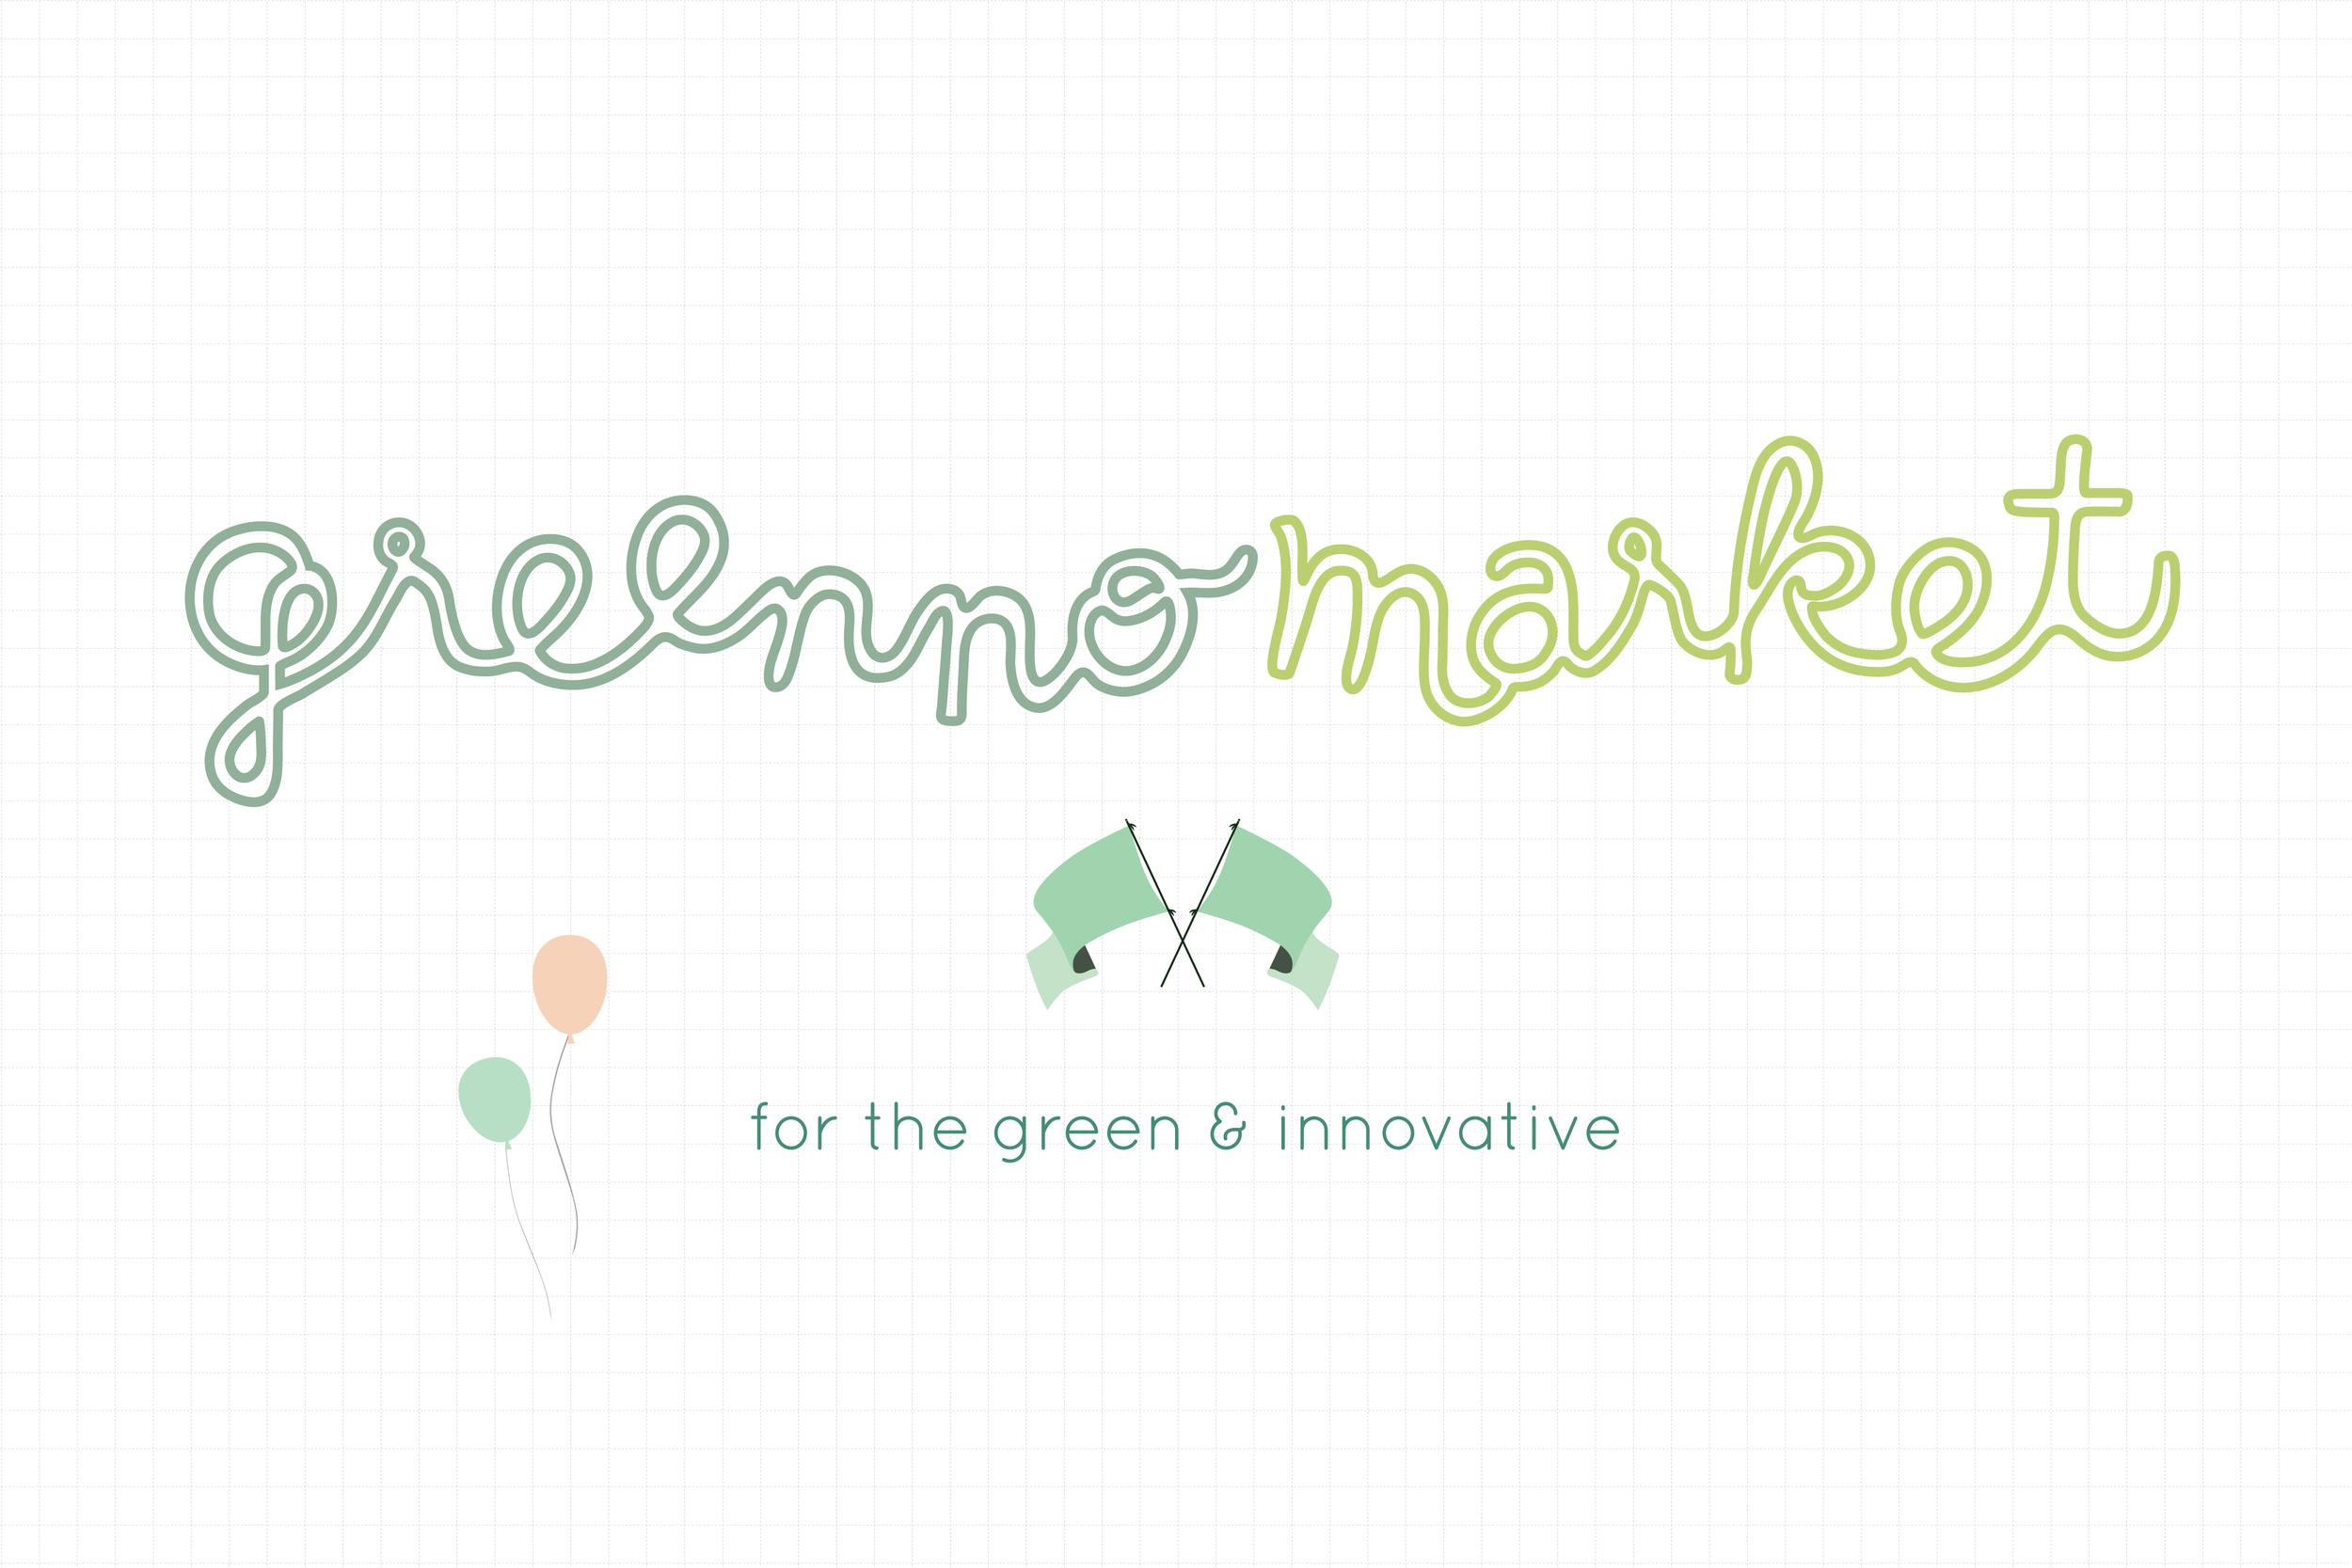 Greennomarket 2015